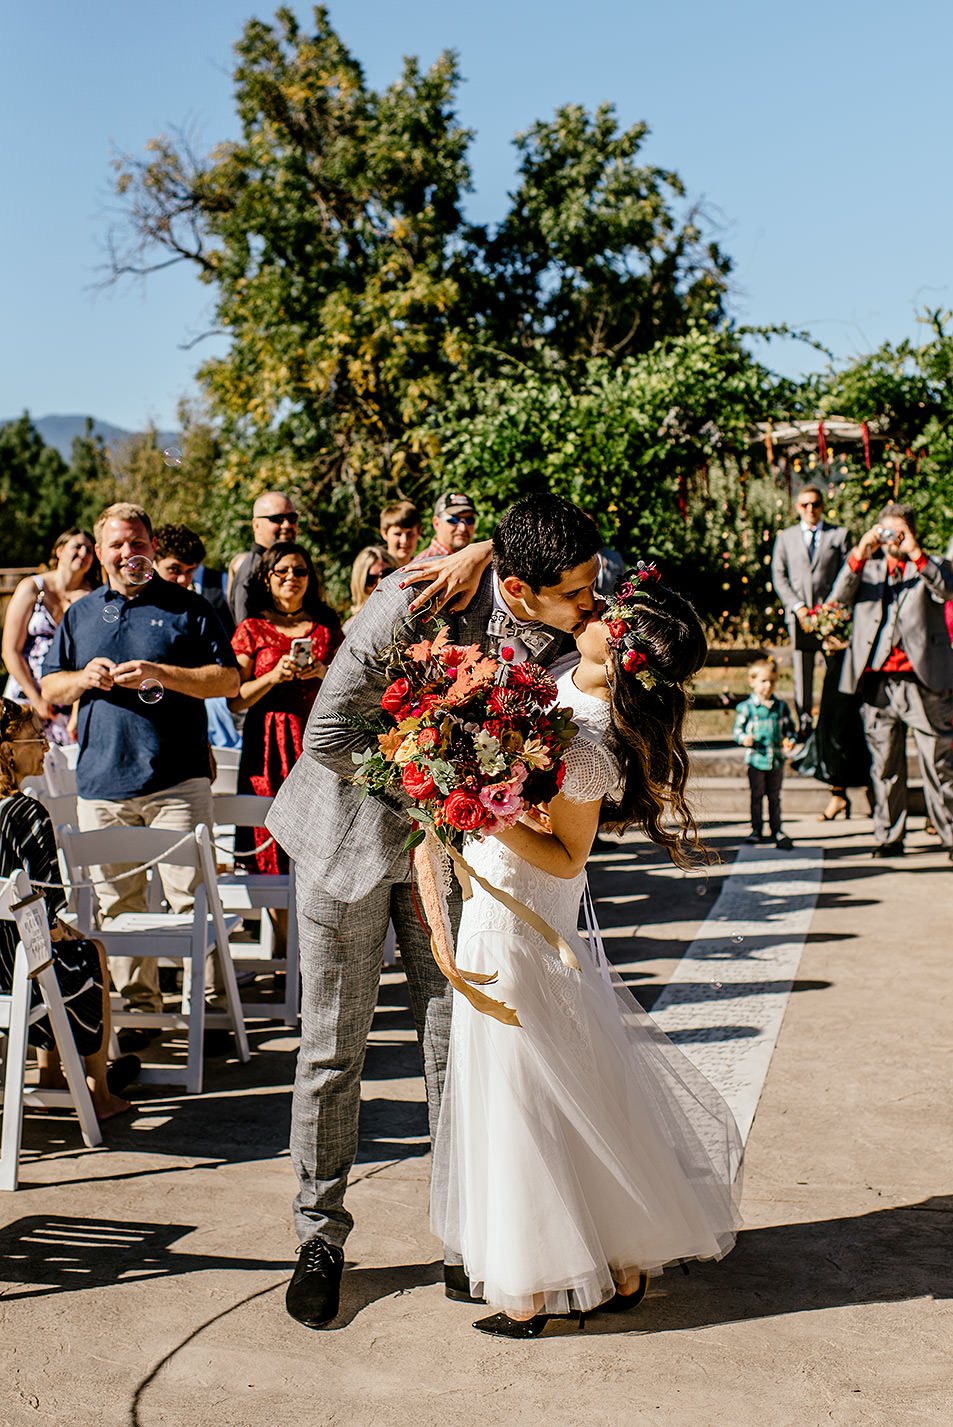 Tin-roof-Barn-wedding-Portland-Oregon-wedding-photographer-0456.jpg